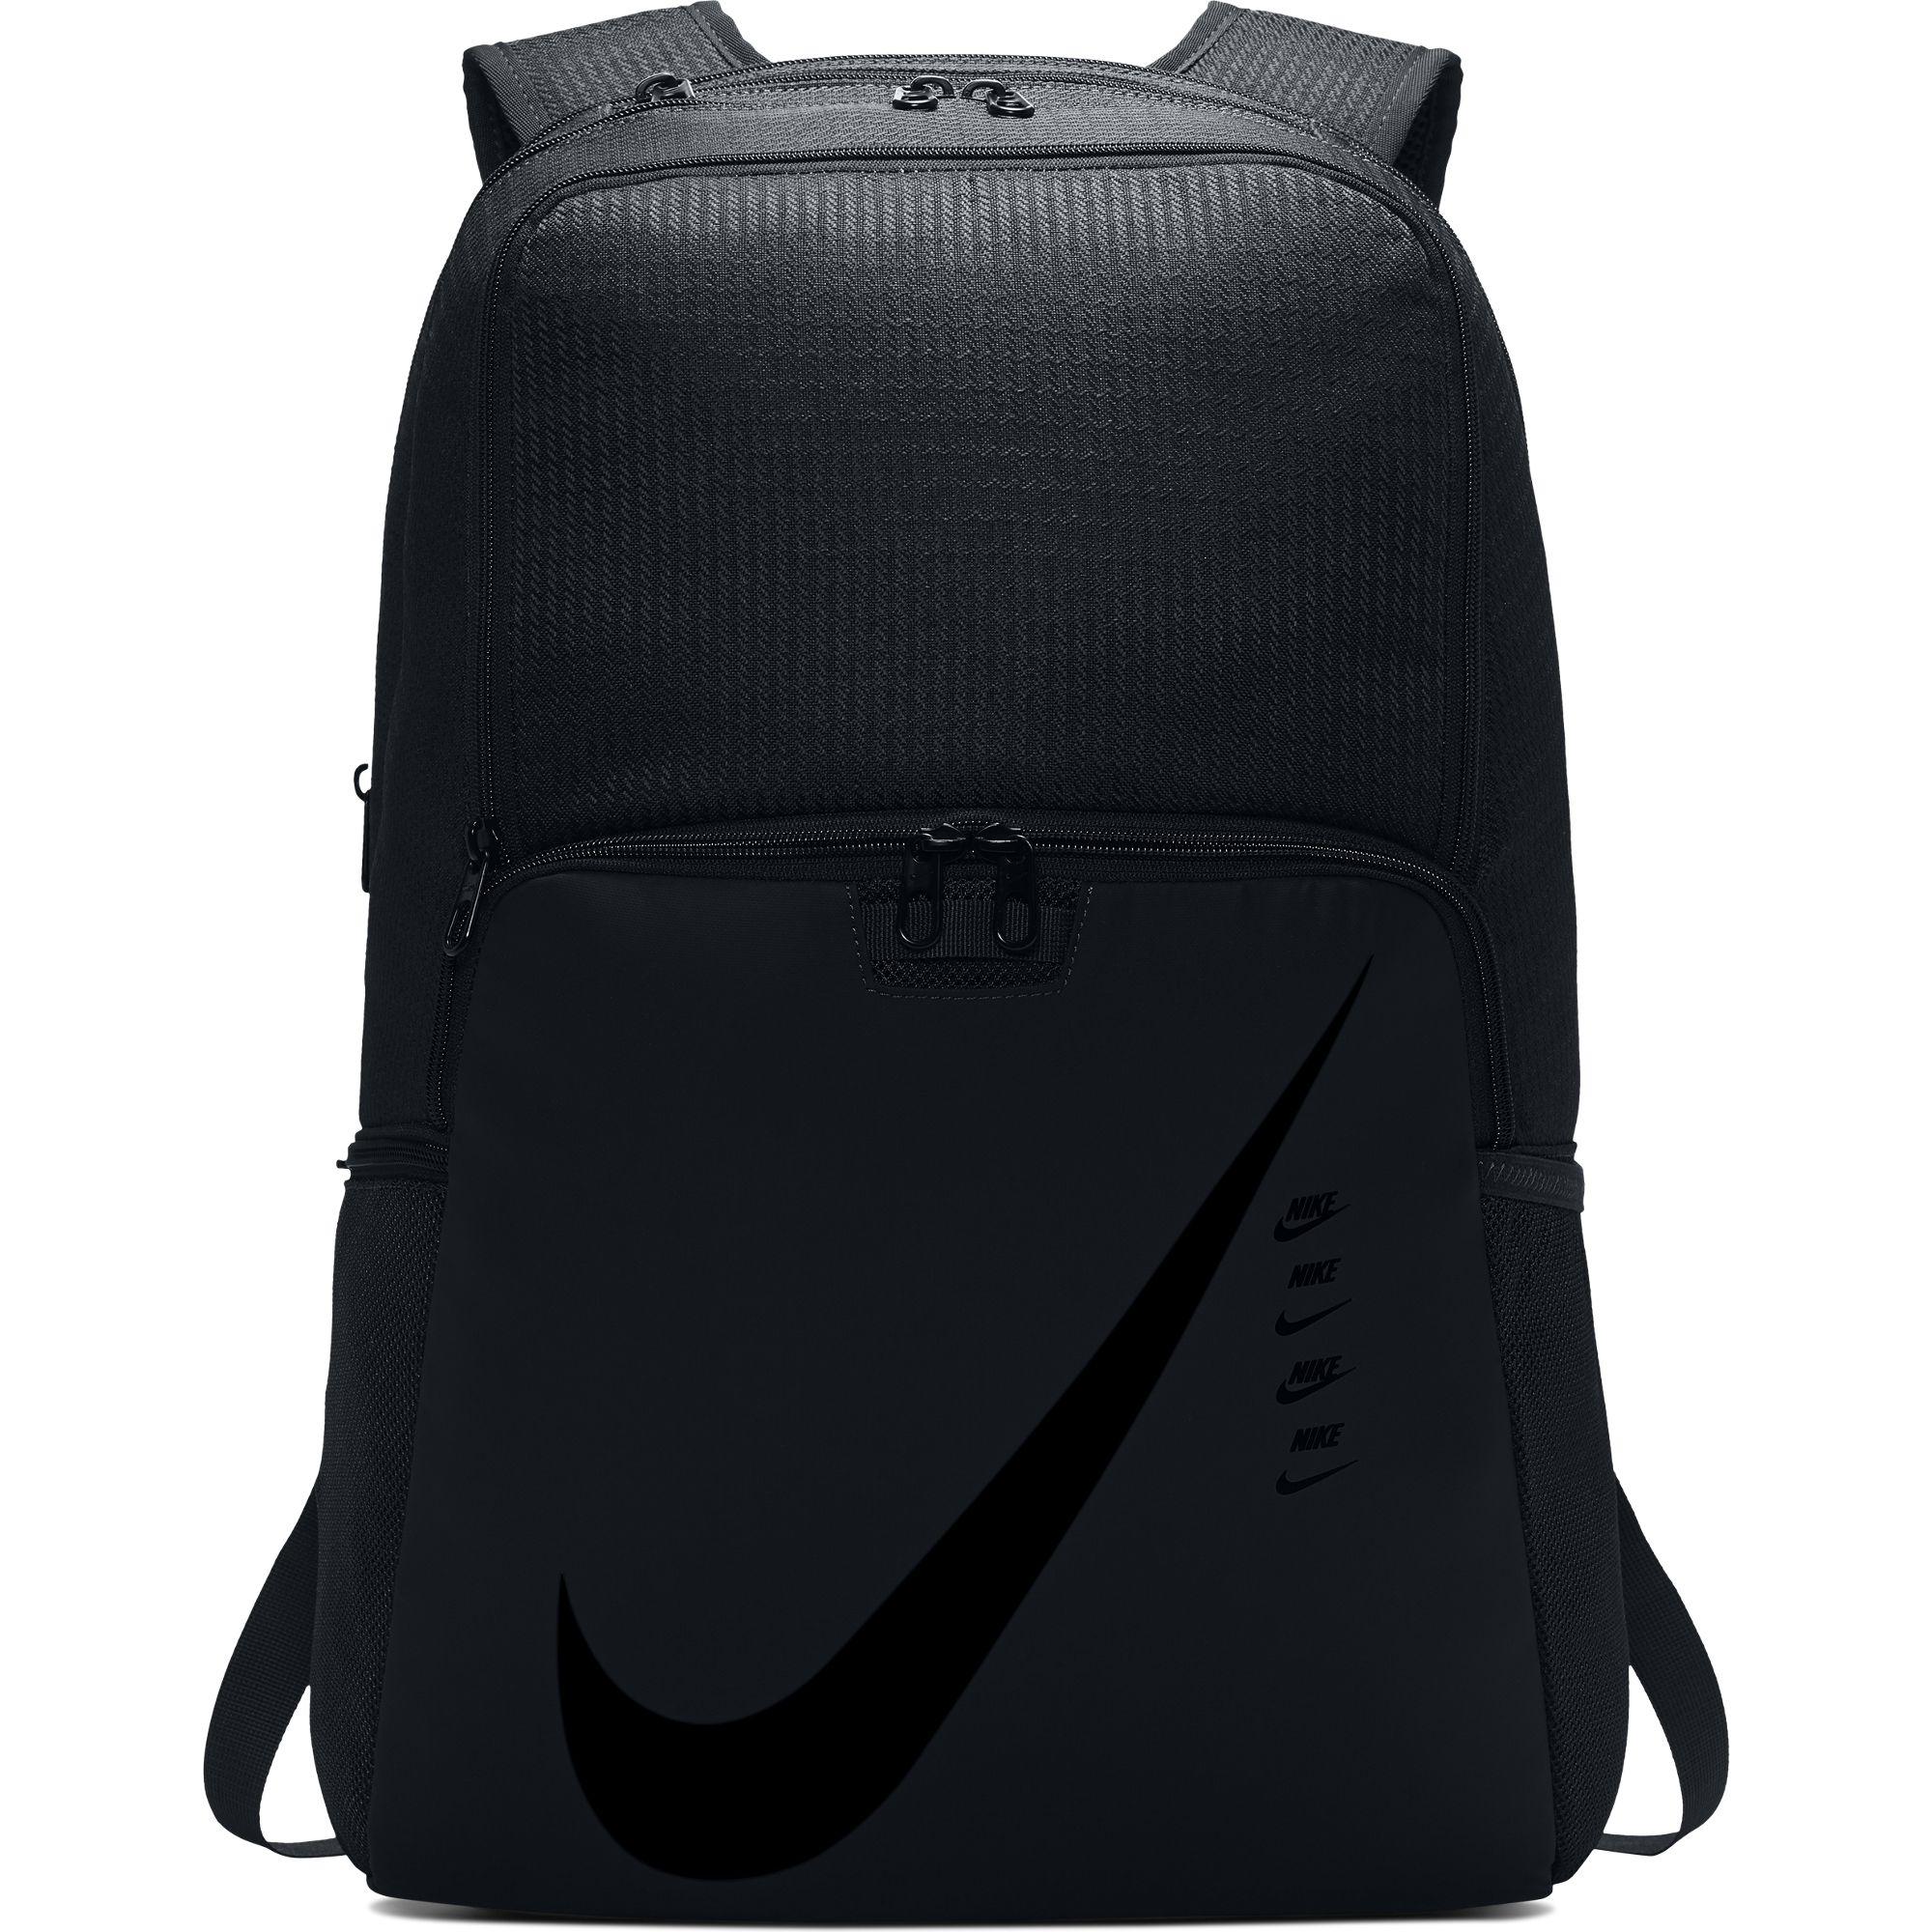 Brasilia XL Backpack, Black/Black, swatch